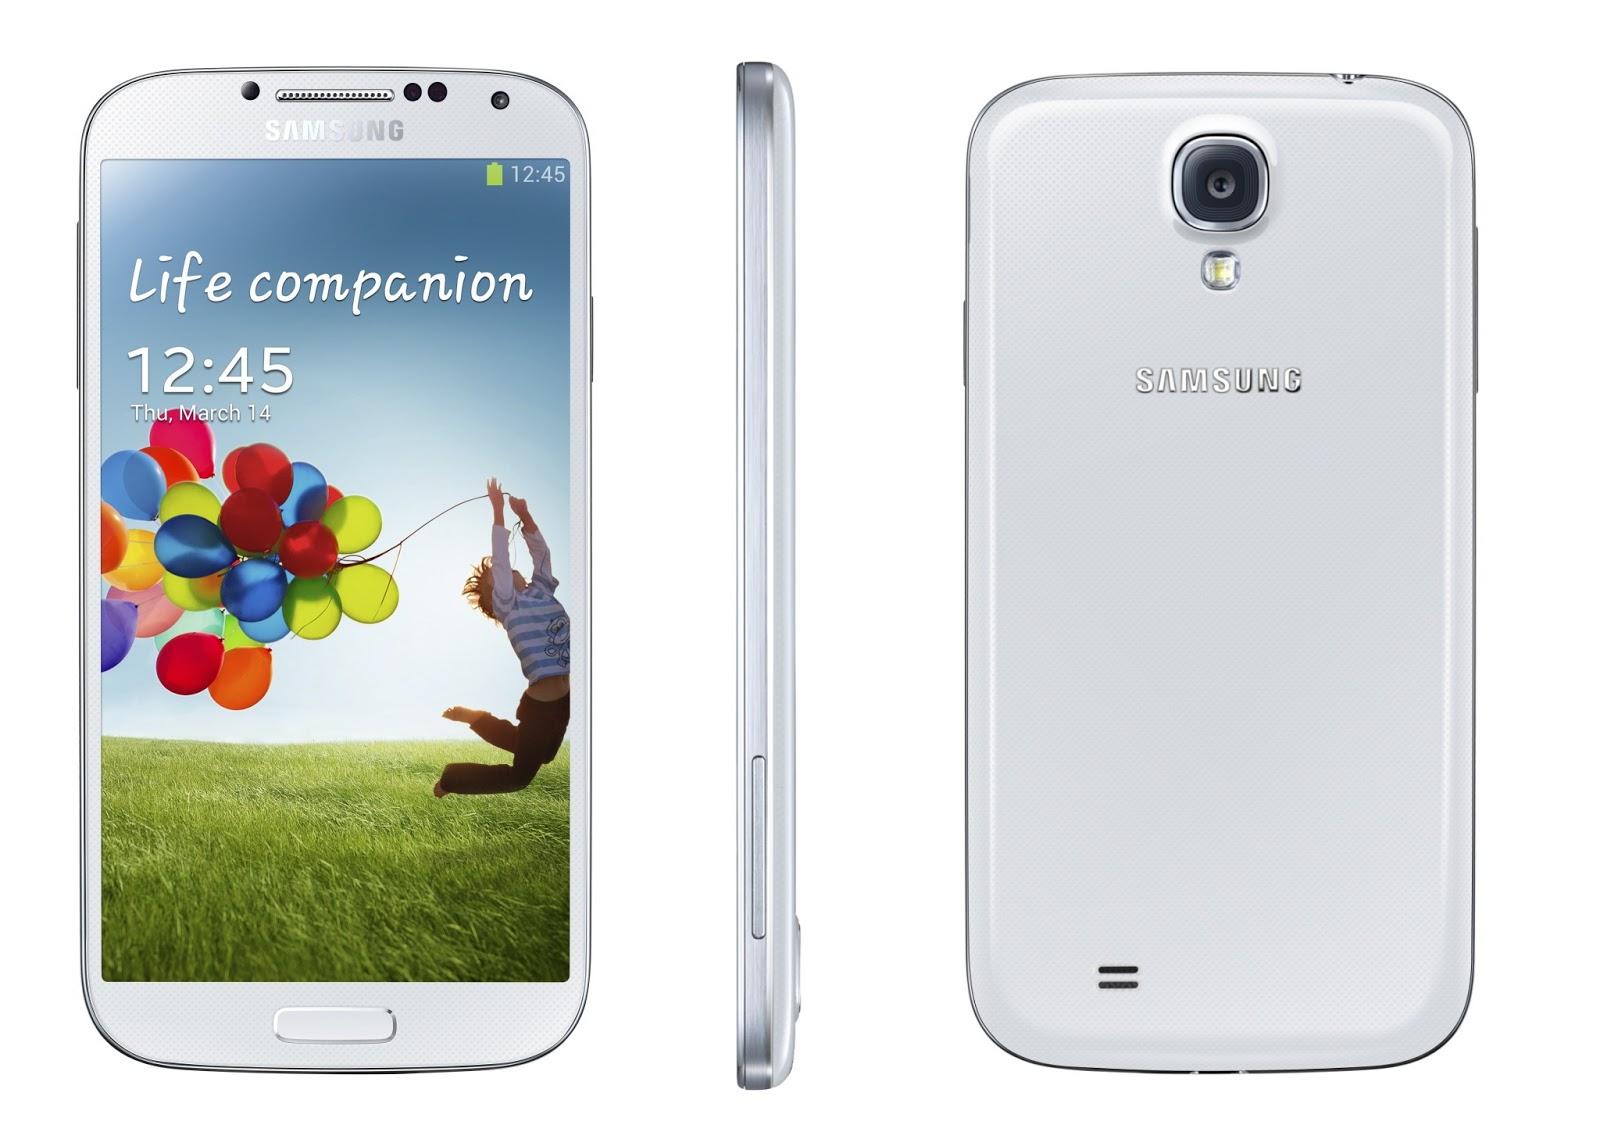 SAMSUNG Galaxy S4 [i9500] - White